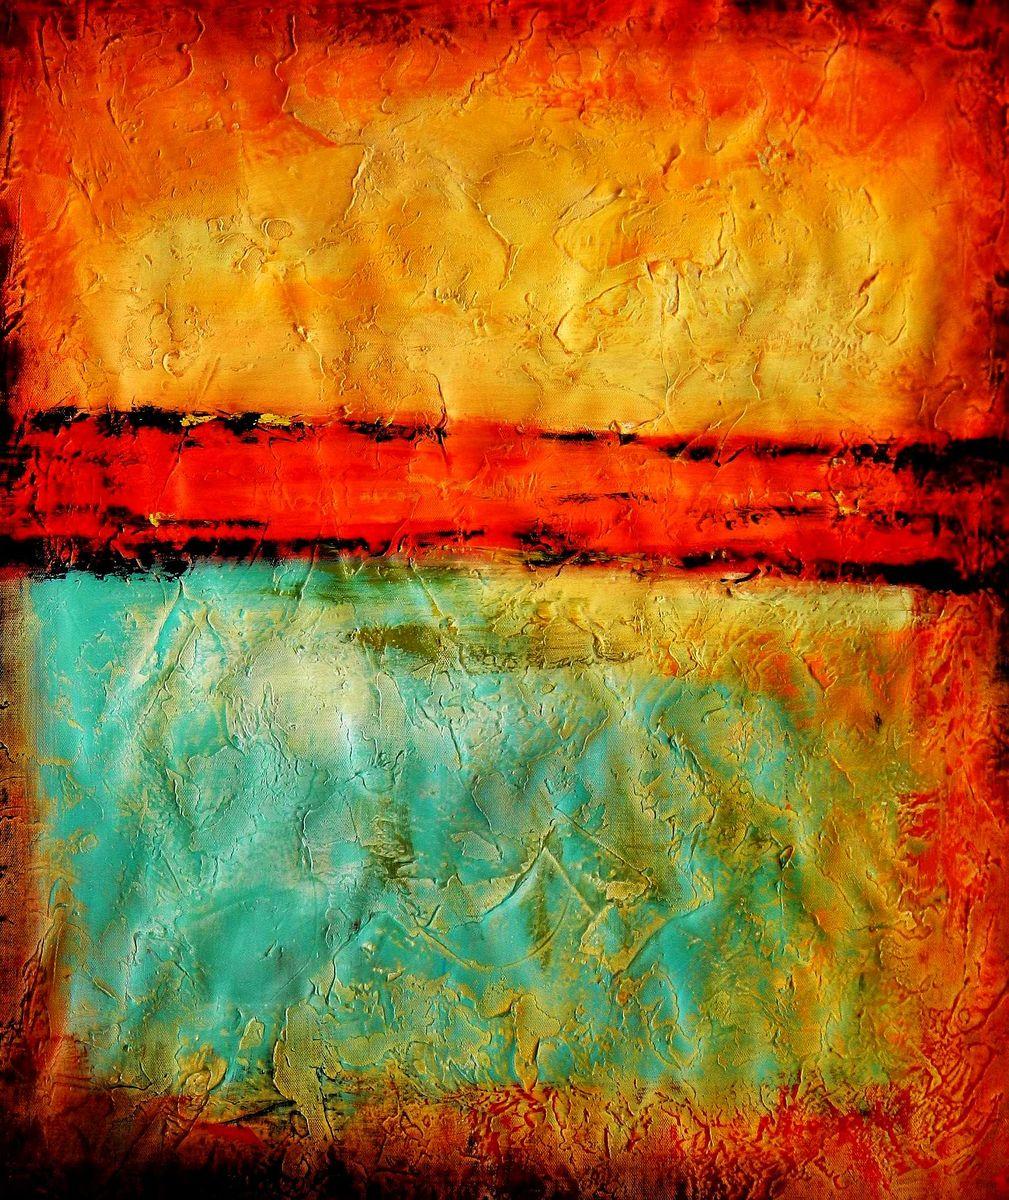 Abstract - Mirage in Babylon c95752 50x60cm abstraktes Ölbild